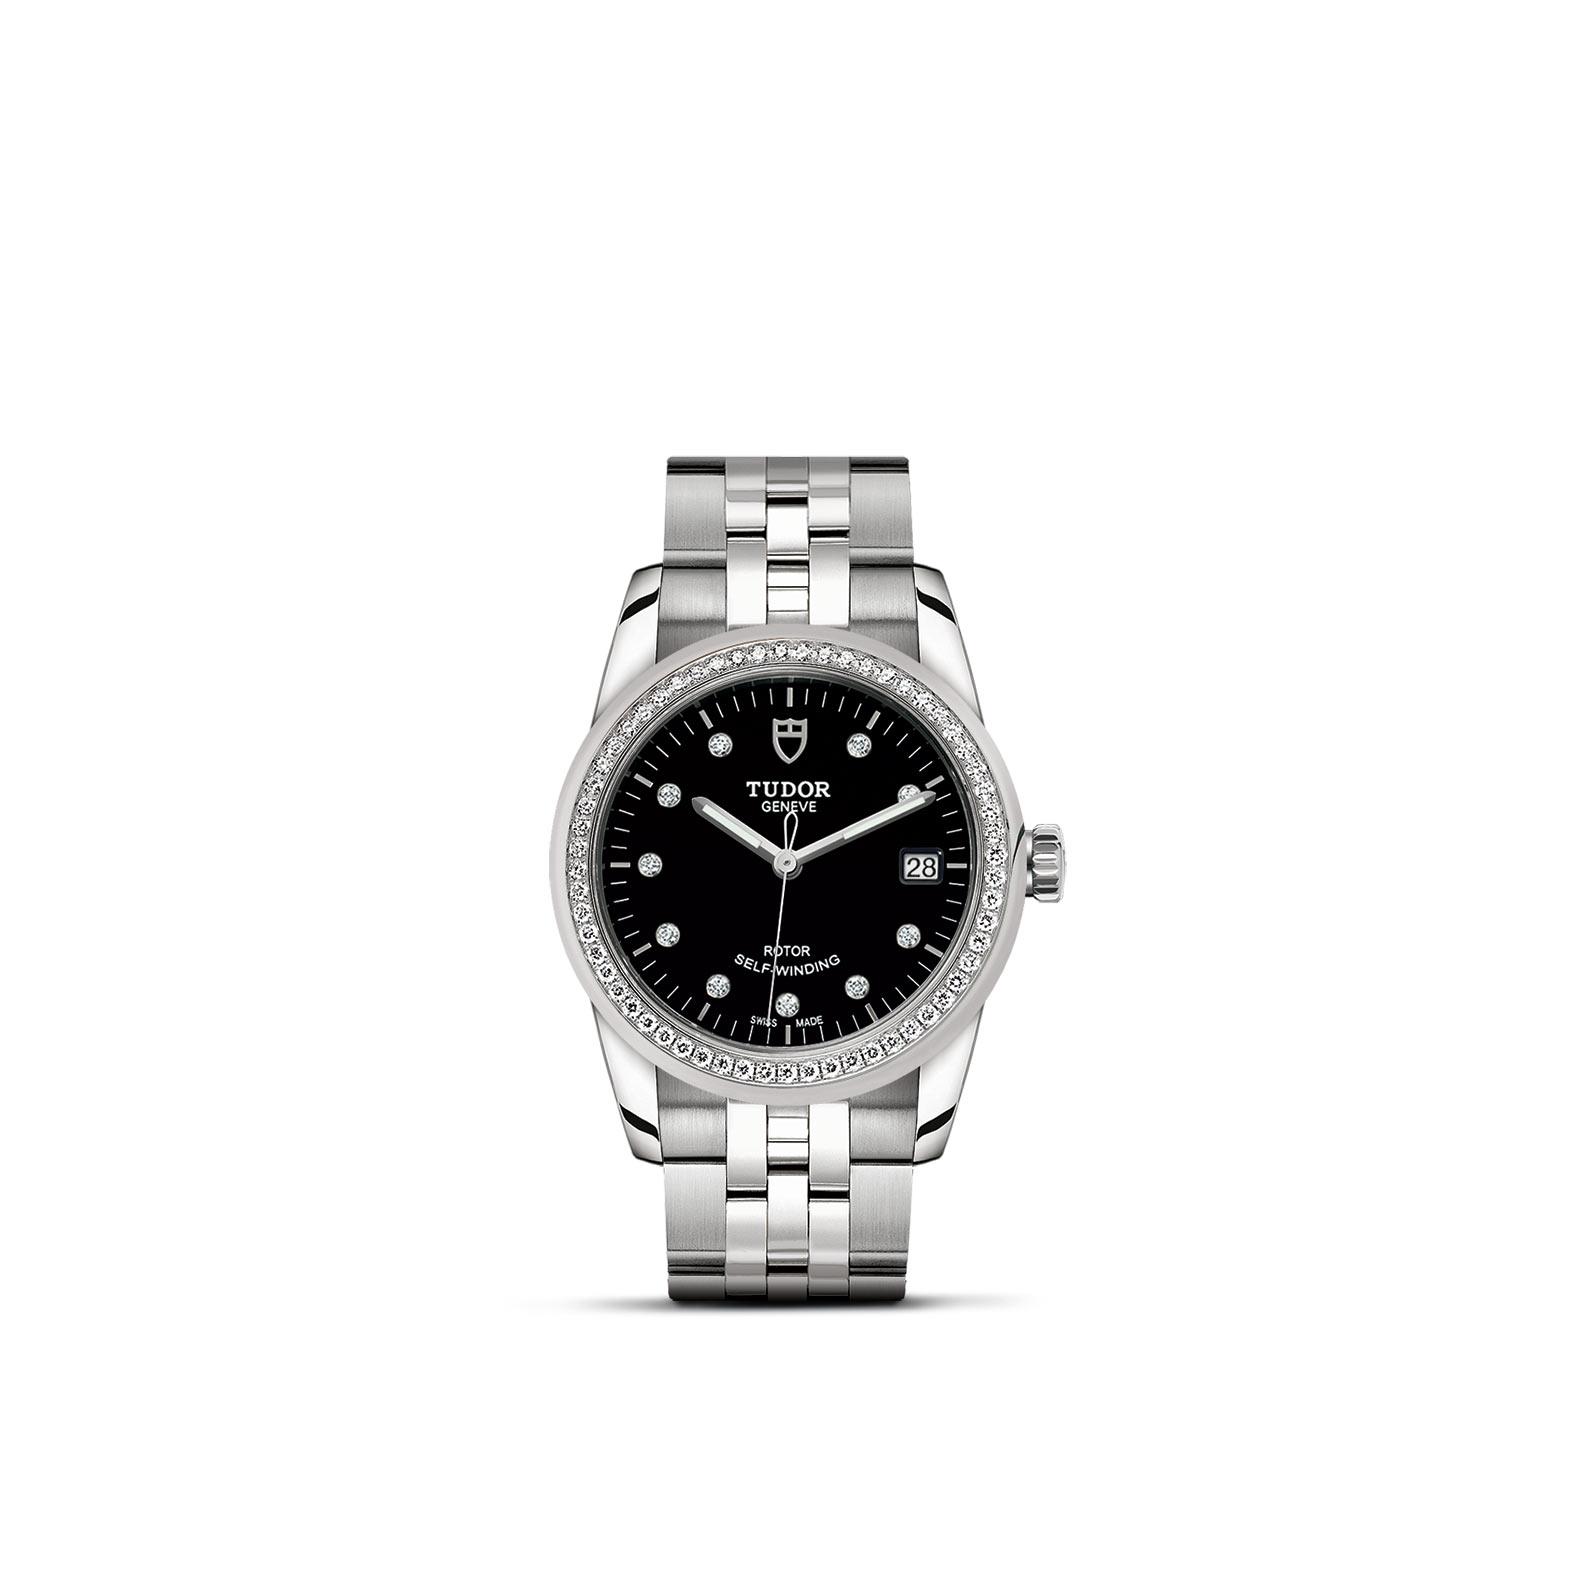 TUDOR Glamour Date M55020 0007 Upright